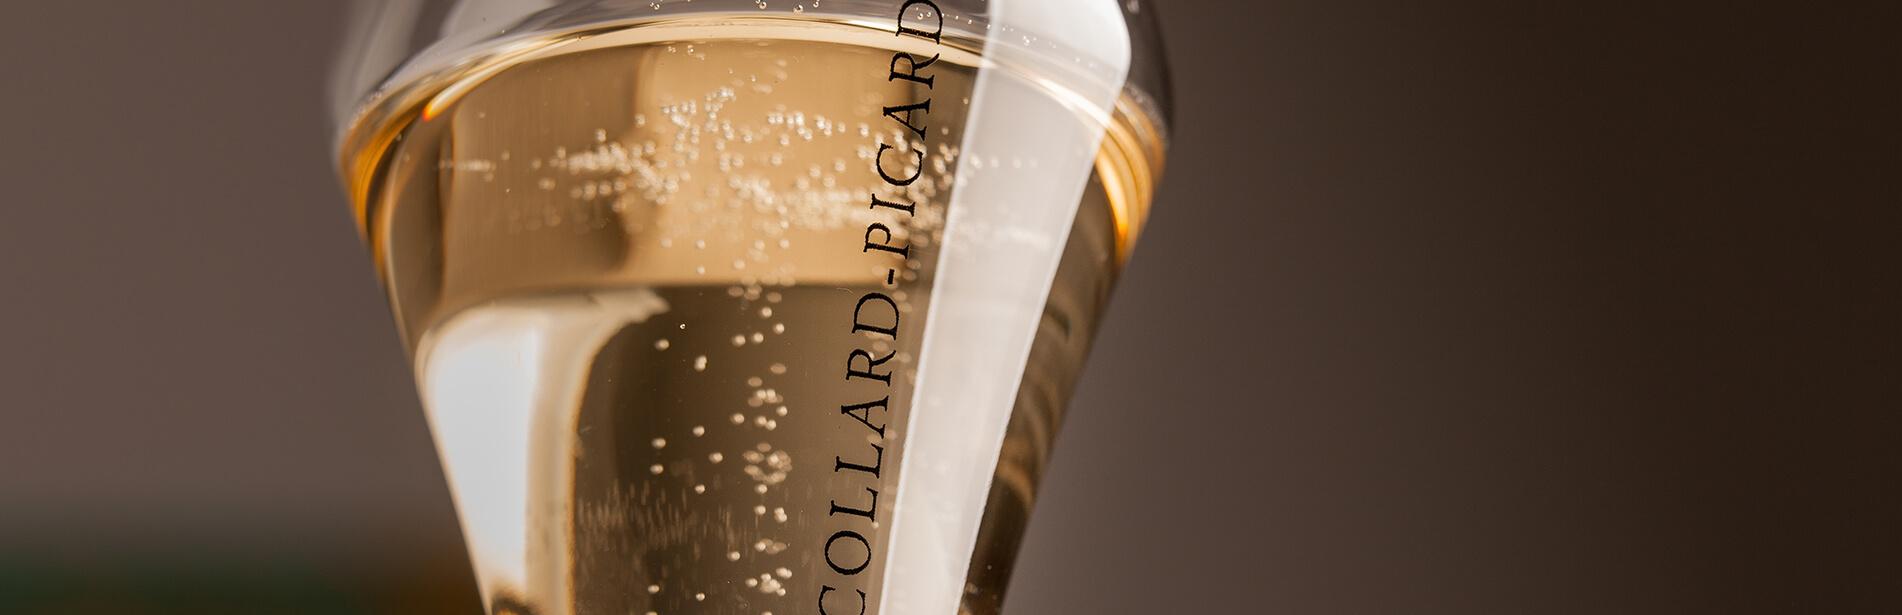 Collard Picard-glas